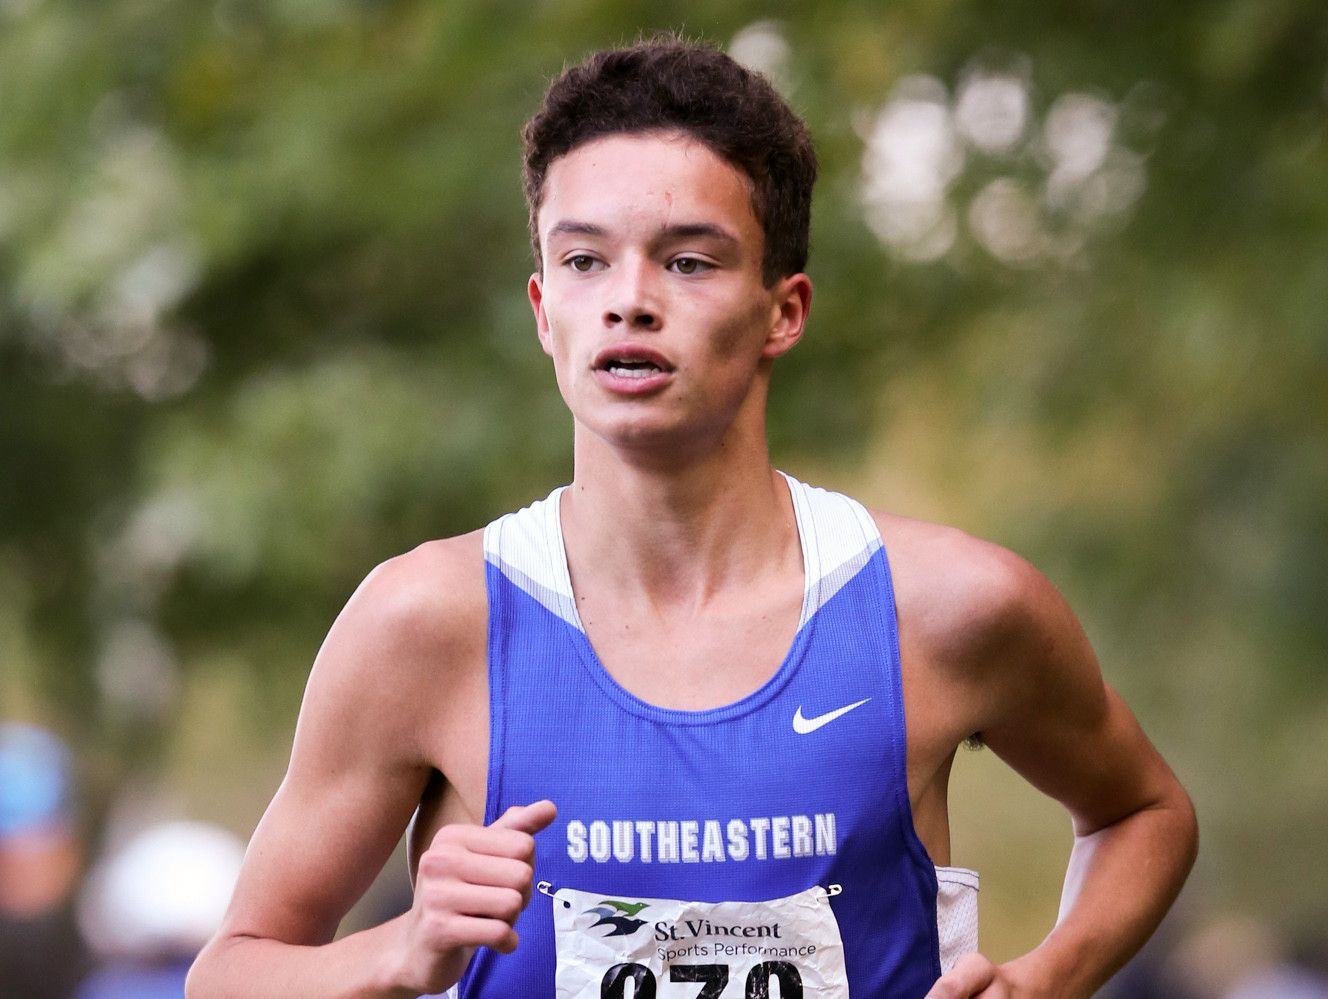 Hamilton Southeastern's Gabe Fendel captured the Noblesville regional crown Saturday in the boys race.